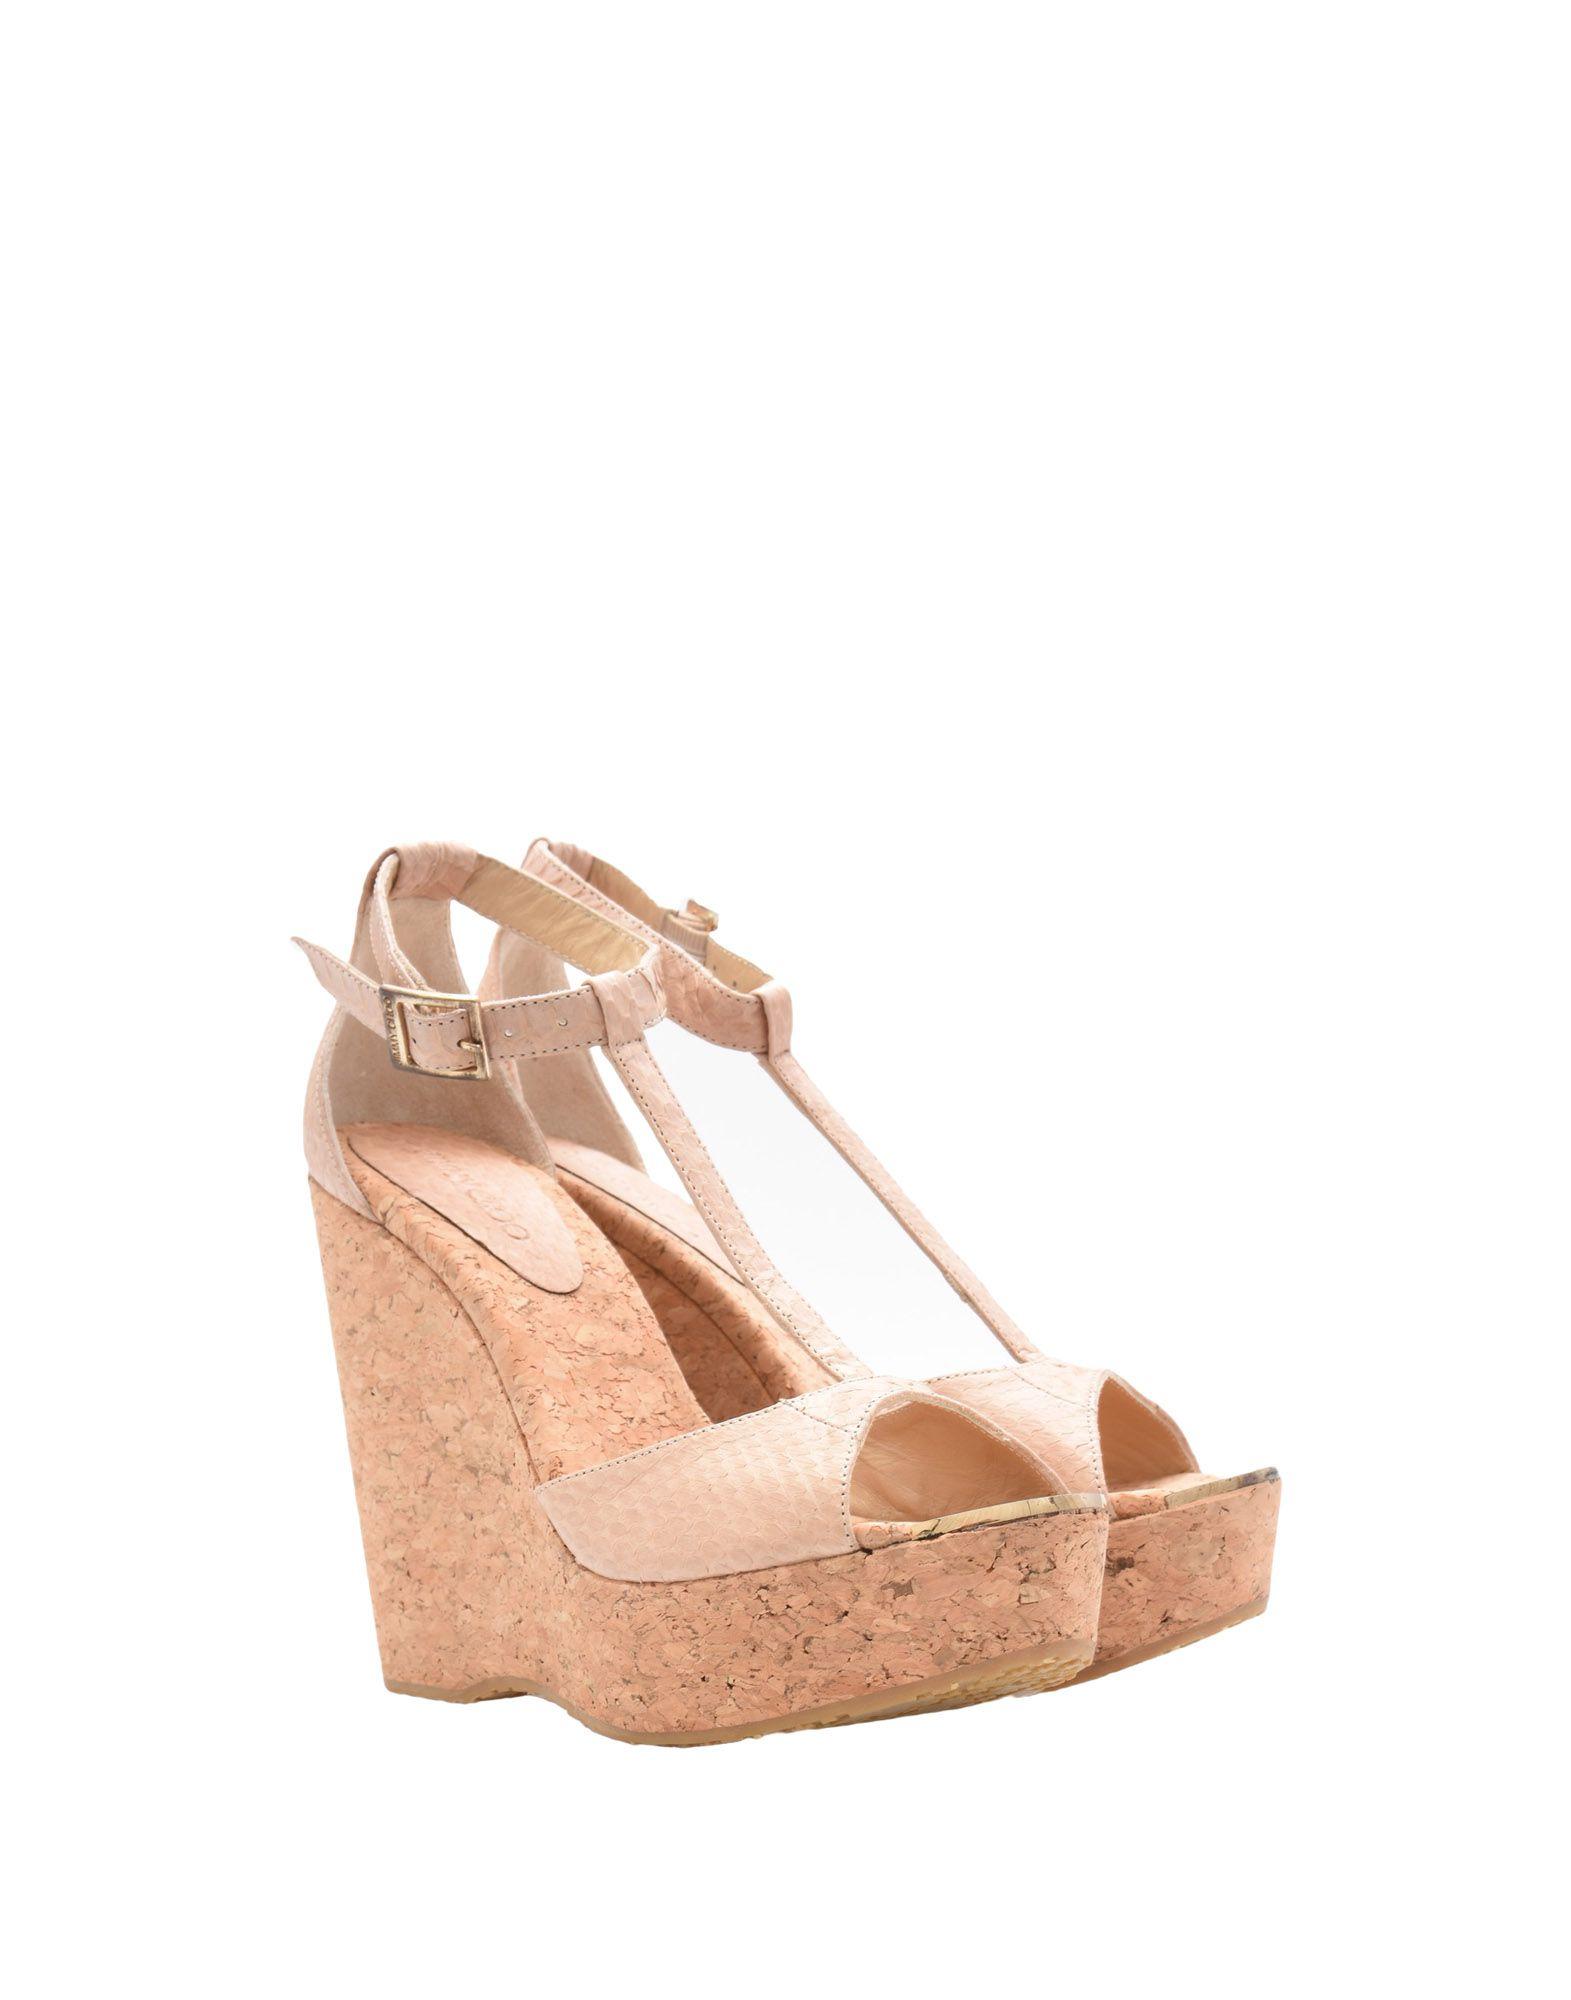 Jimmy Choo Sandalen Damen Neue  11478704KM Neue Damen Schuhe f578f8